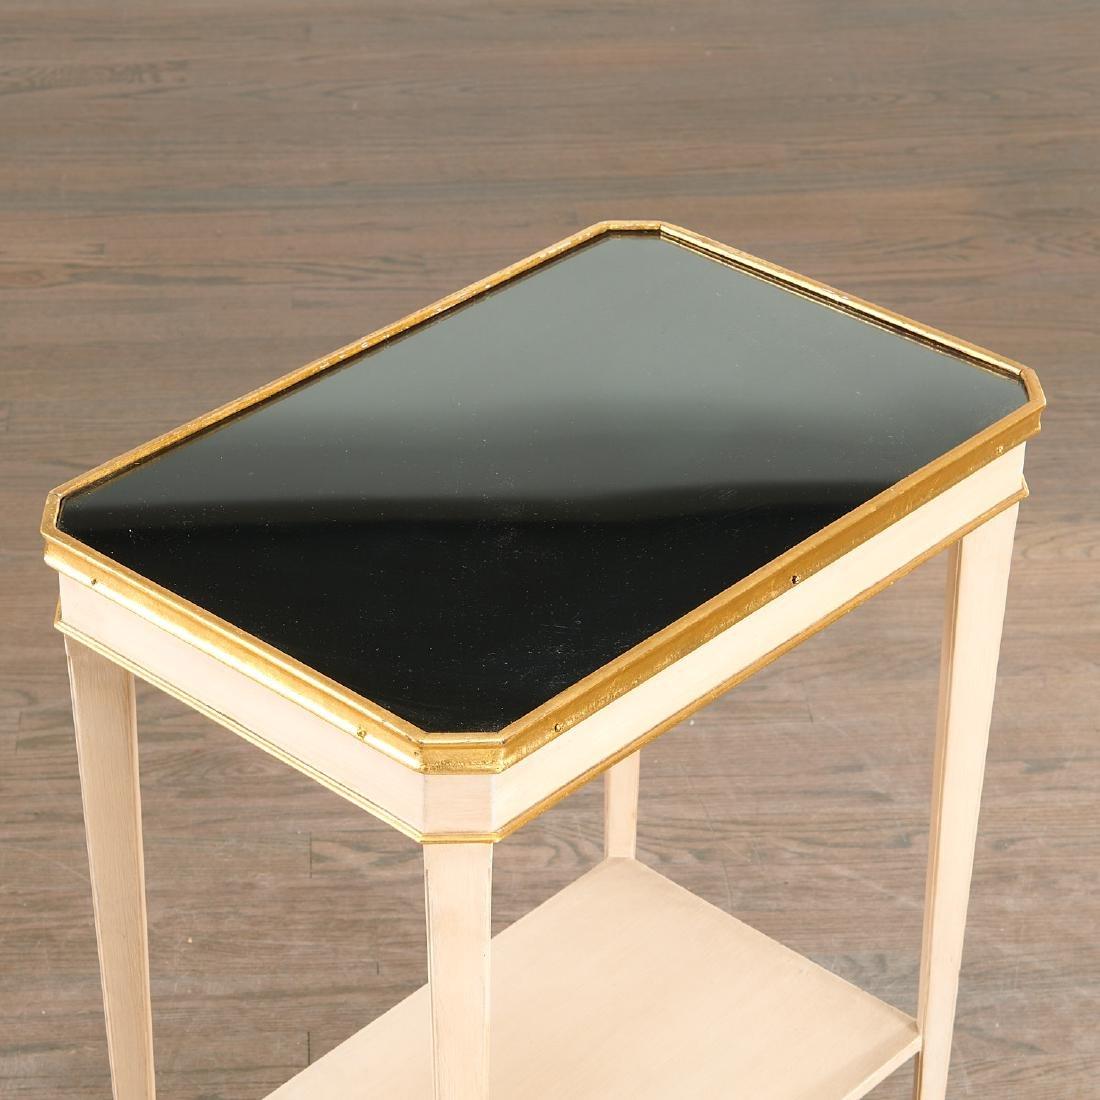 Fine Maison Jansen tiered side tables - 2